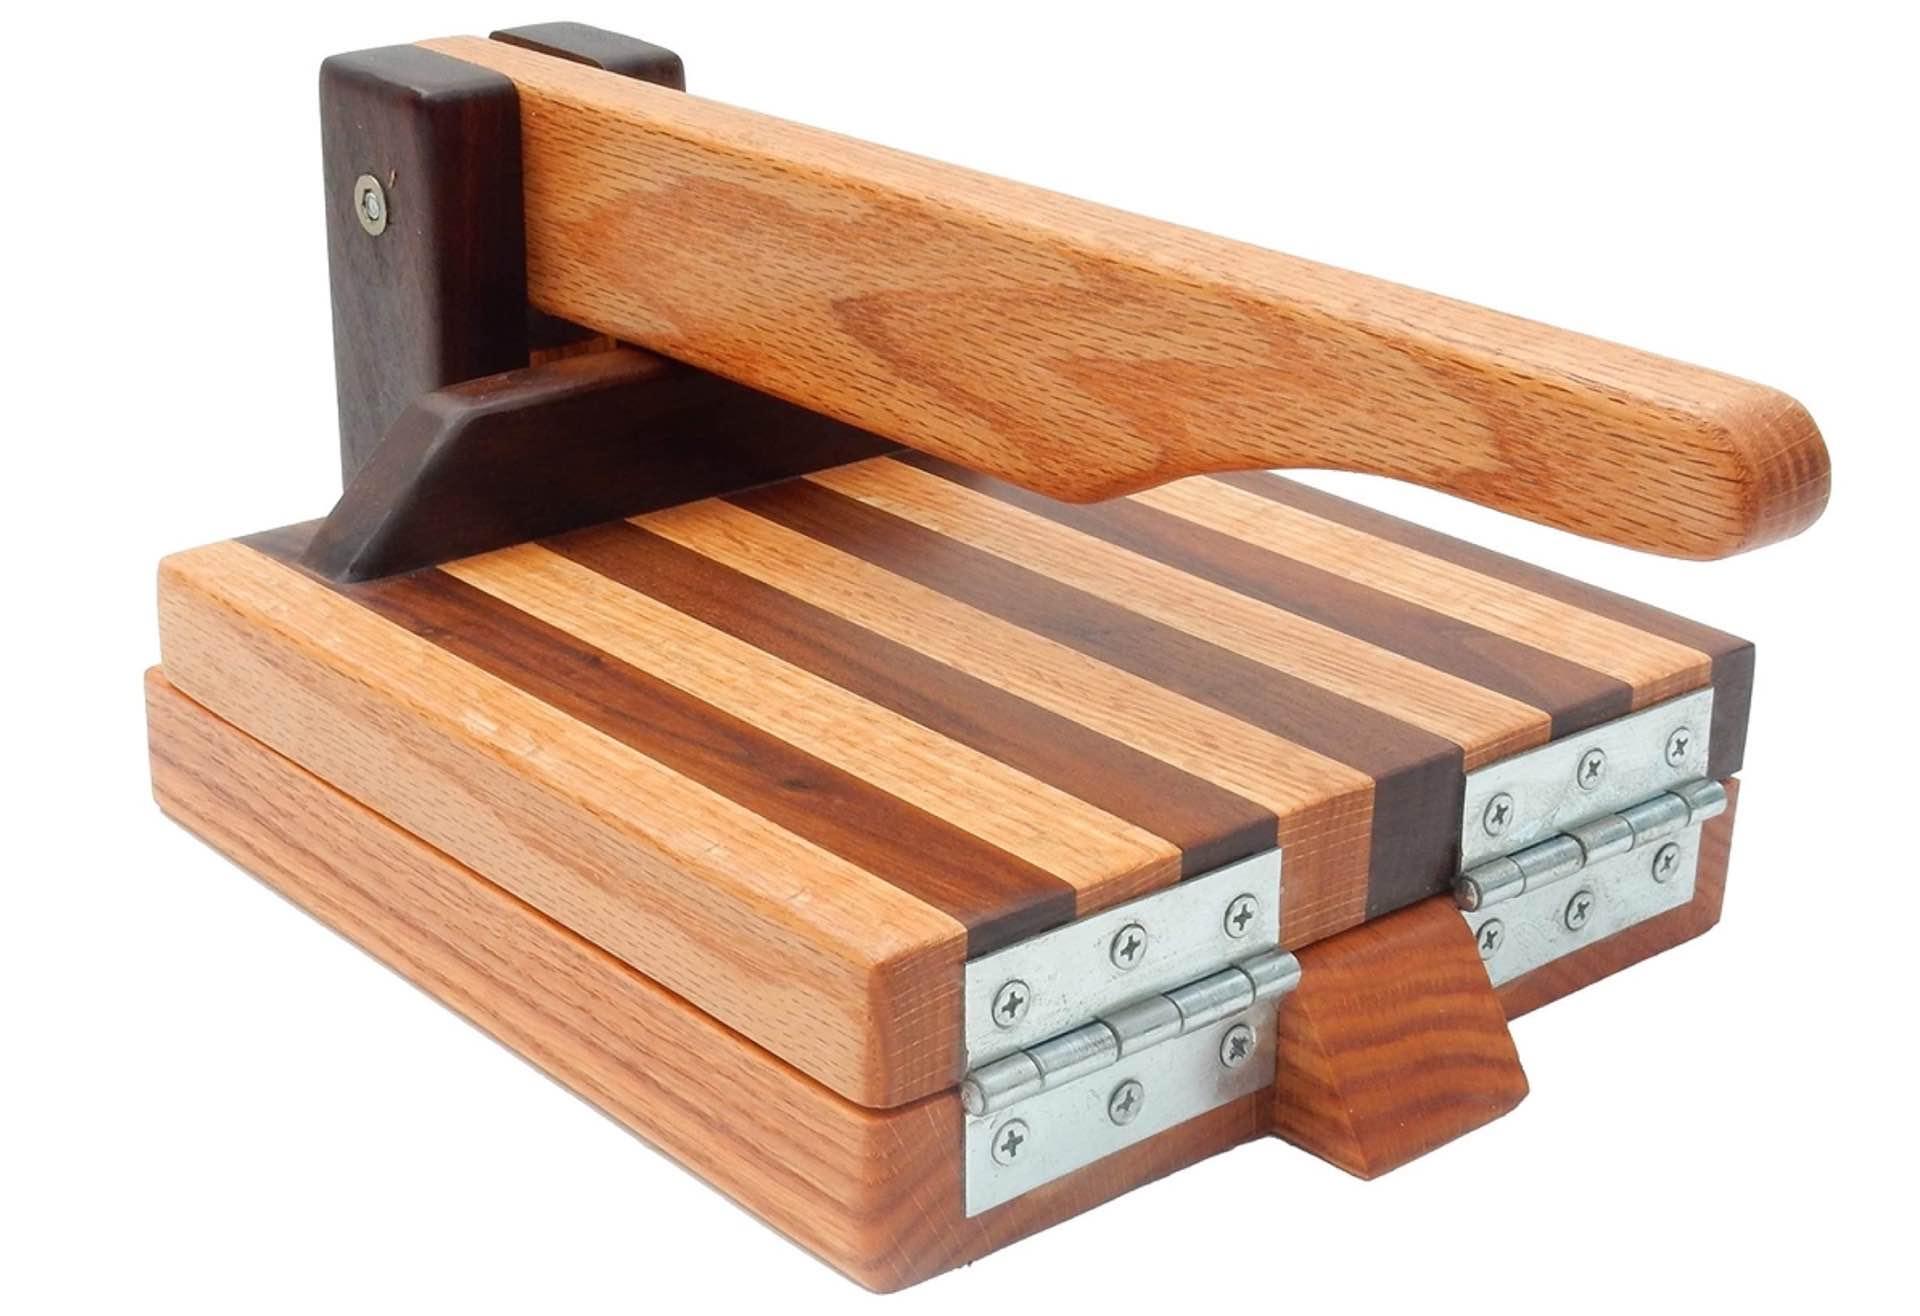 central-coast-woodworks-hardwood-tortilla-press